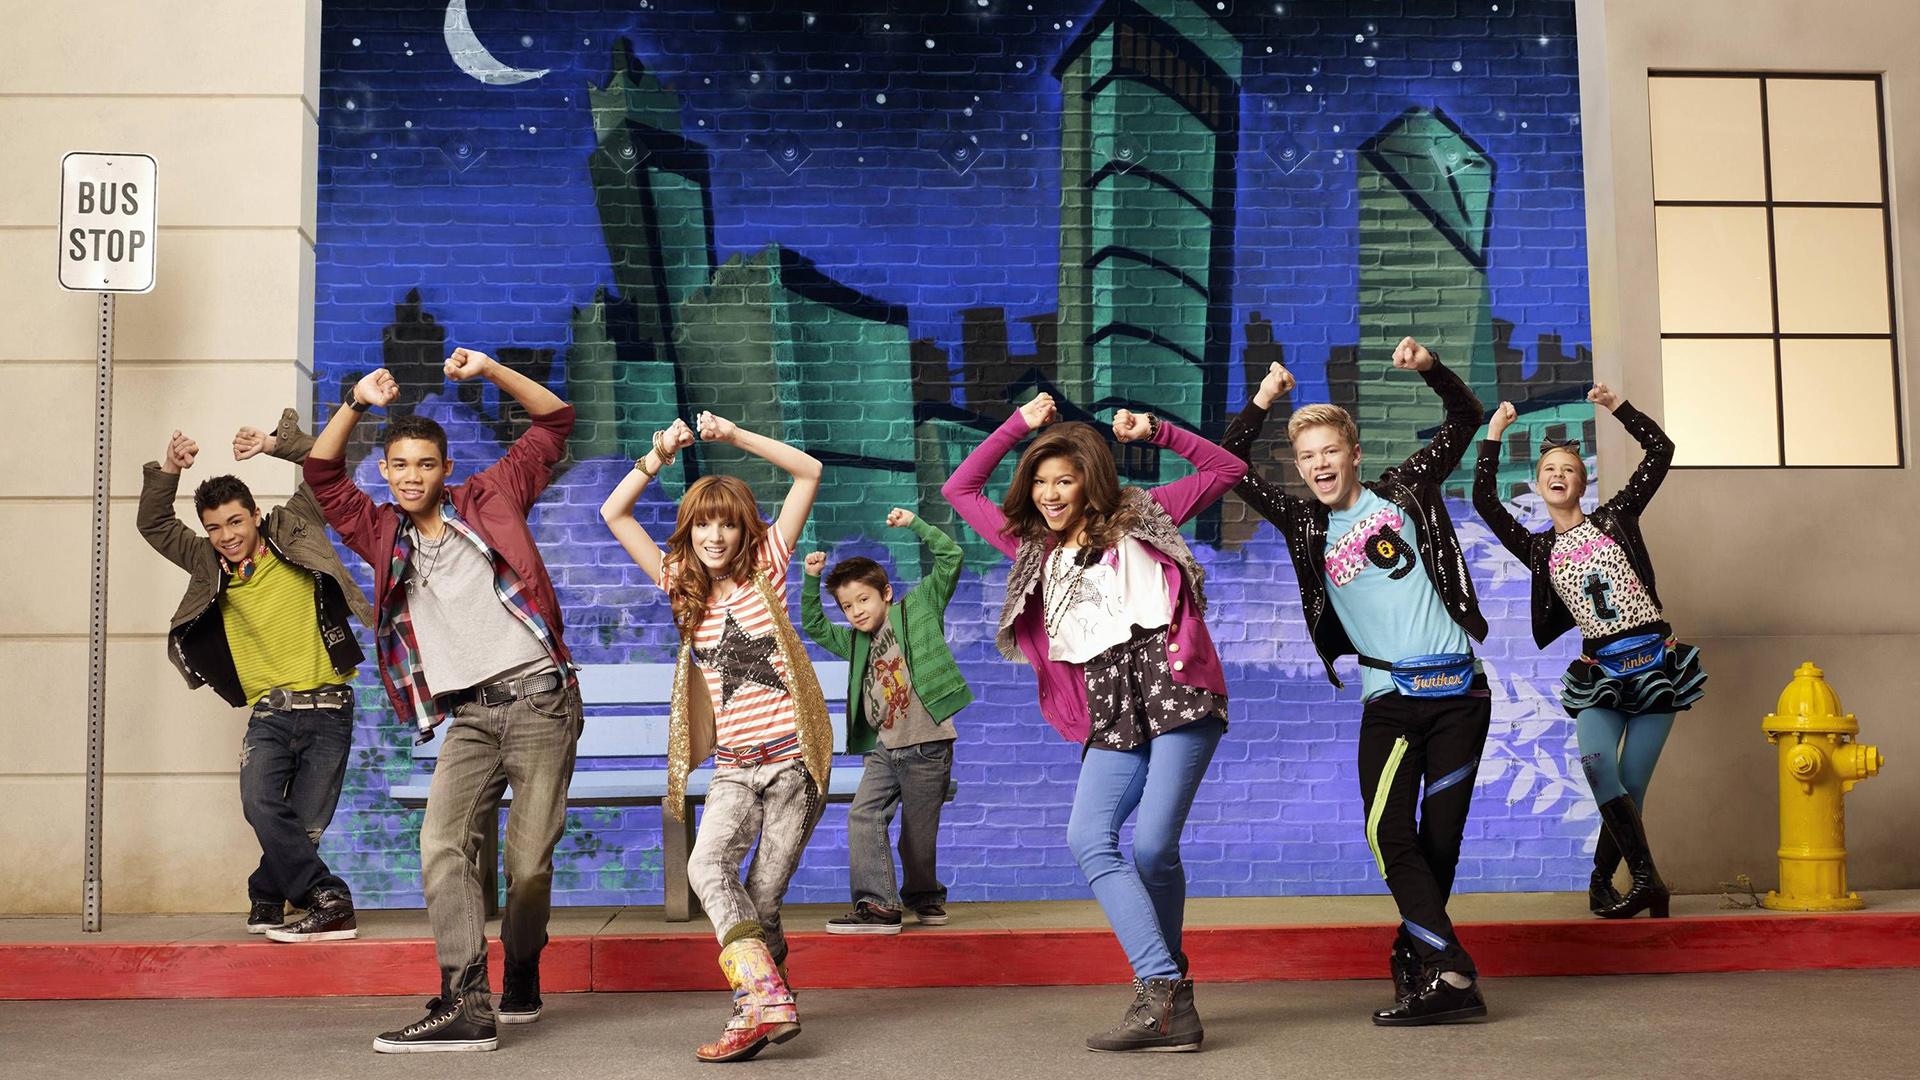 Shake It Up: Mix It Up, Laugh It Up DVD | shopDisney